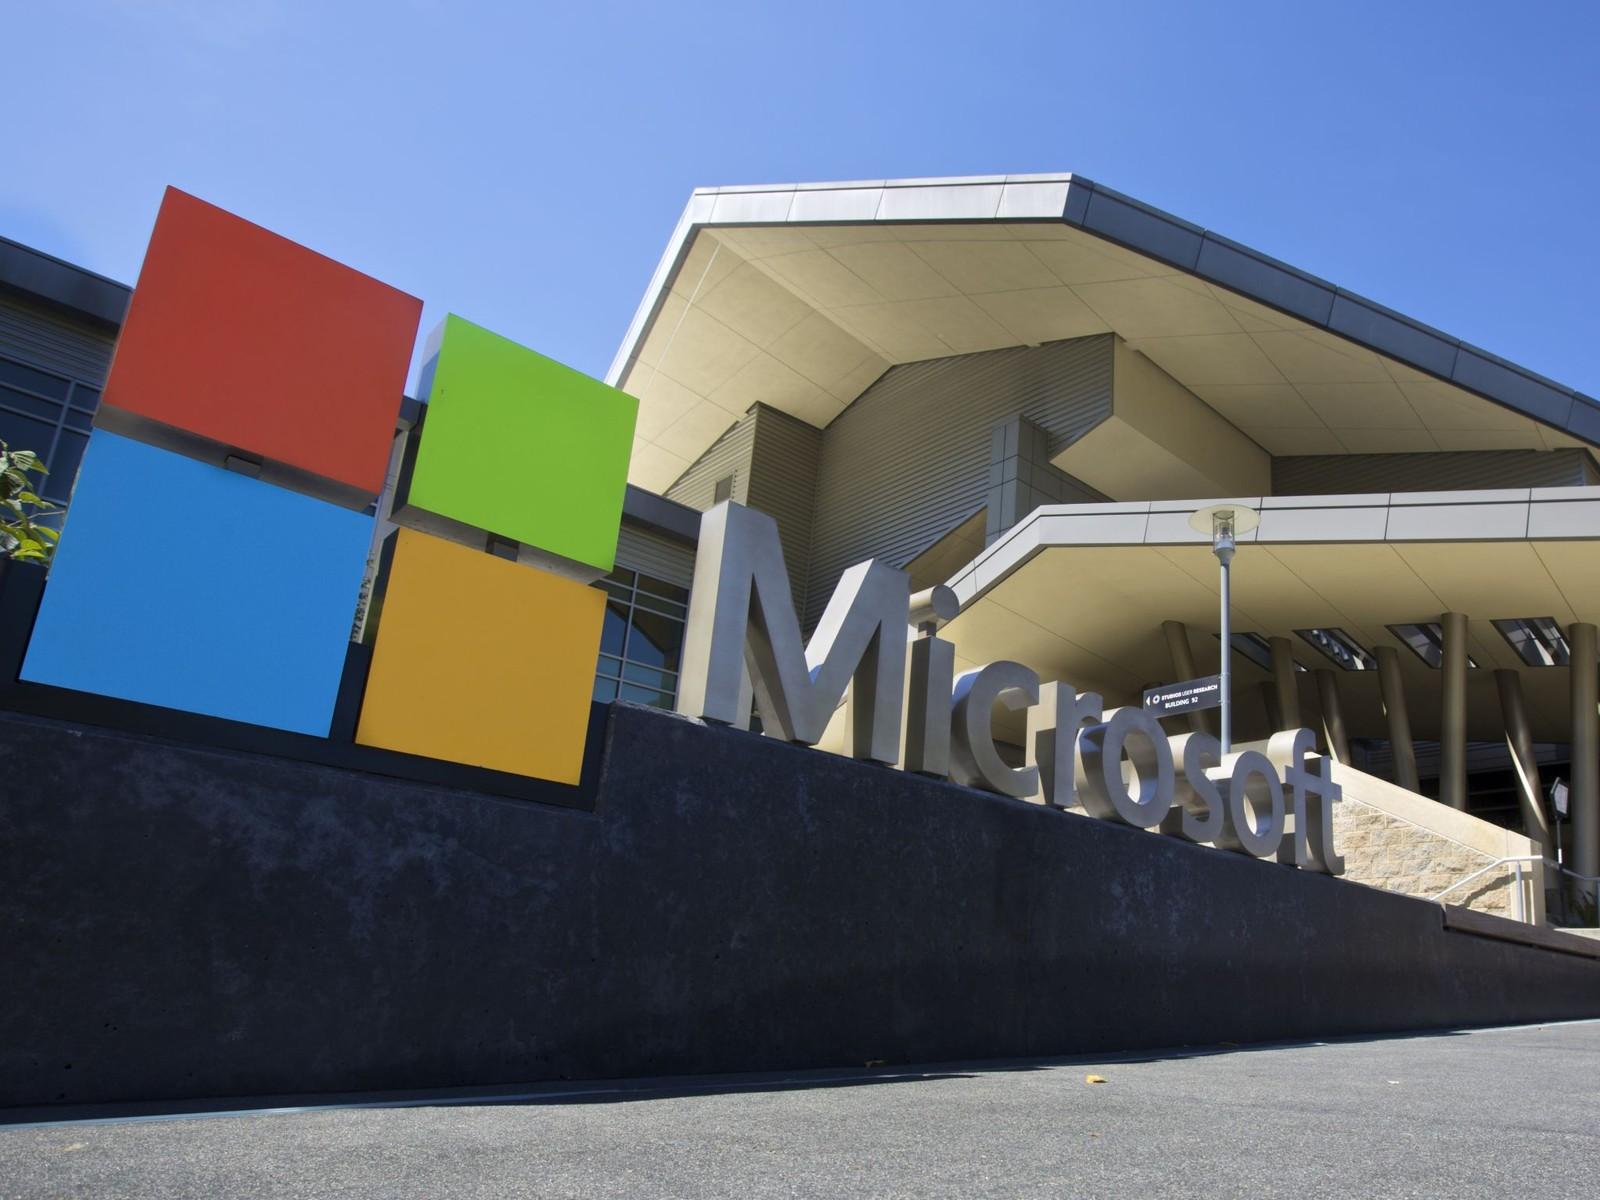 Sídlo Microsoftu v Redmondu